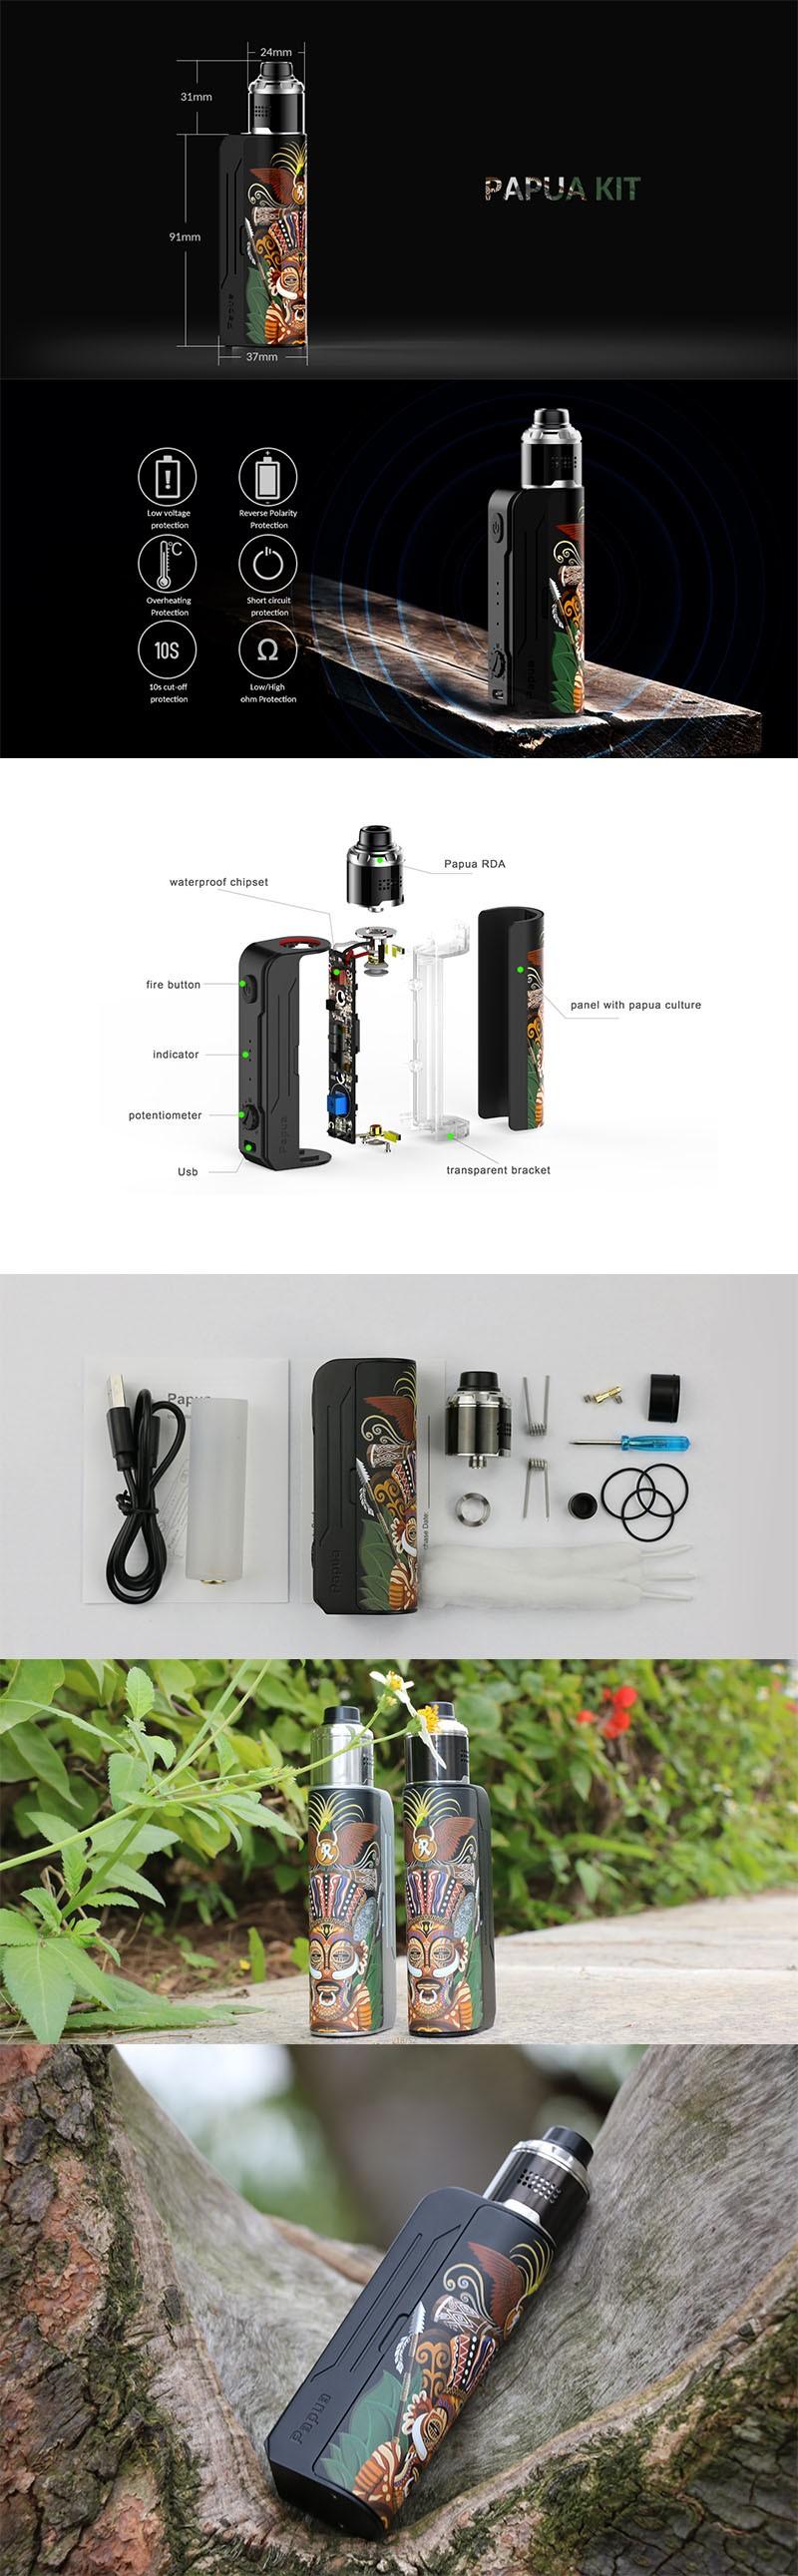 Hippovape Papua 100W VW Variable Wattage Box Mod + RDA Kit